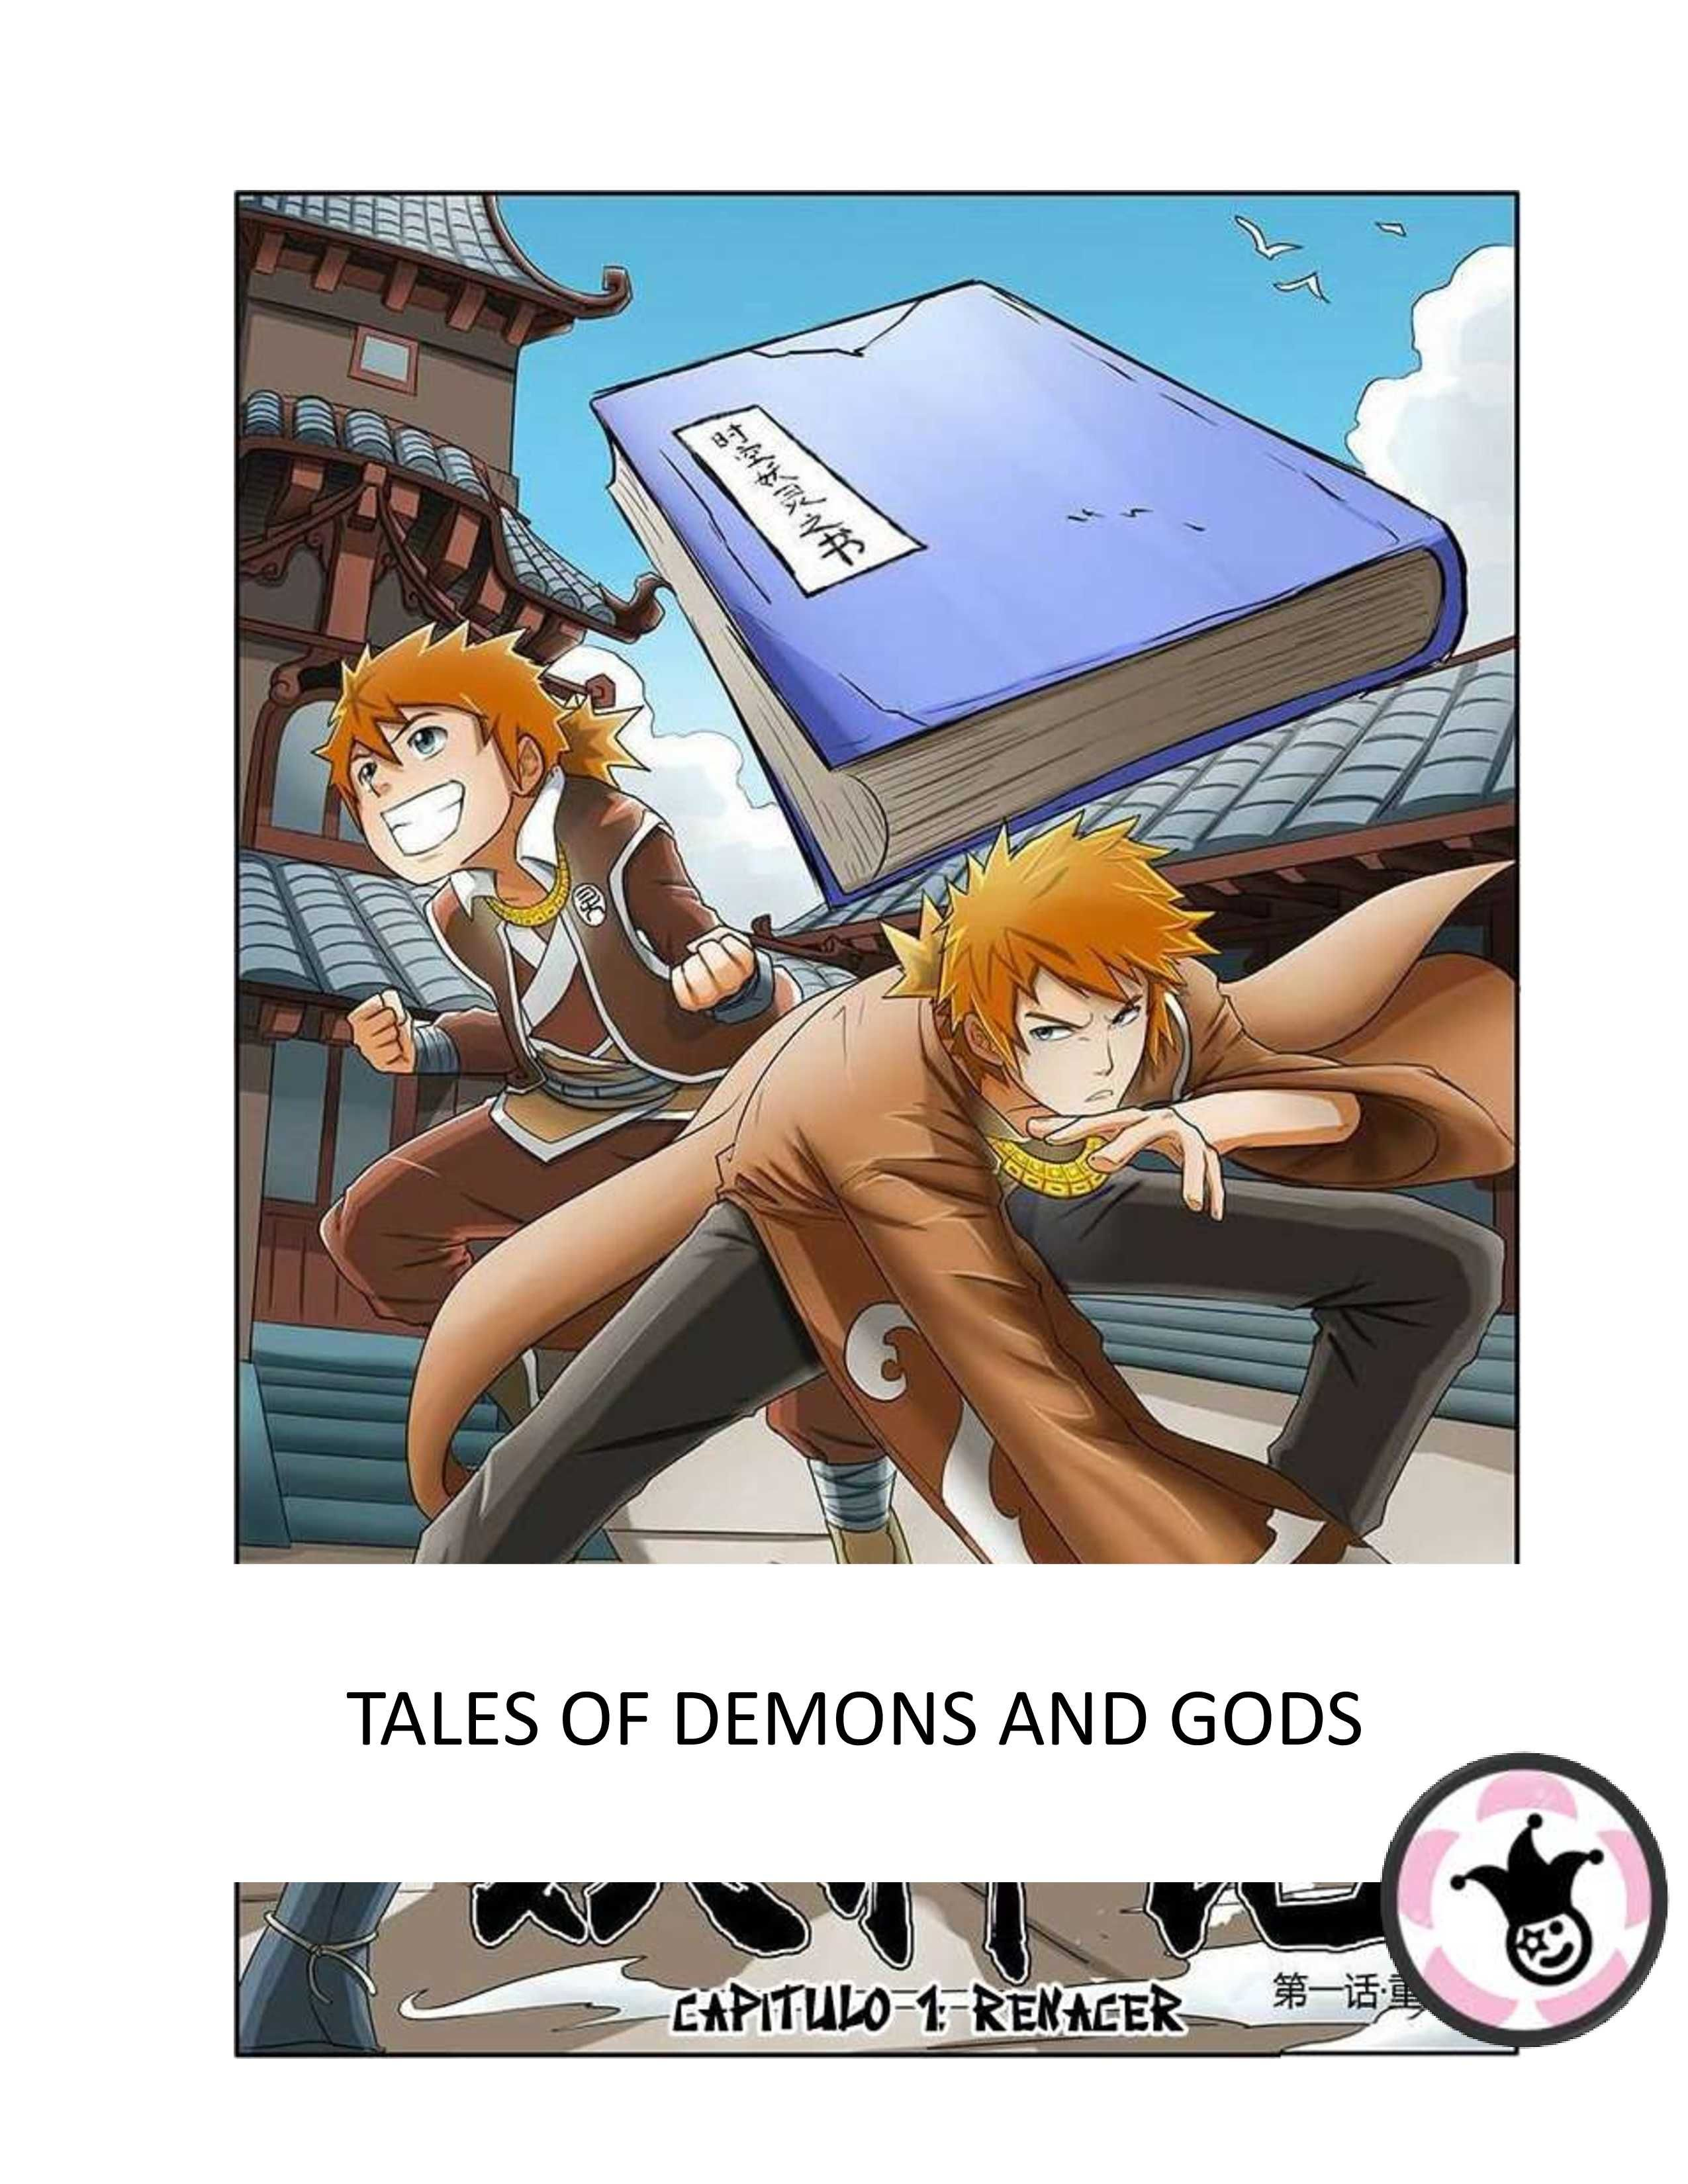 https://c5.ninemanga.com/es_manga/44/20012/484369/a0ed2a3b7dcda7601f6263d120c40b11.jpg Page 1